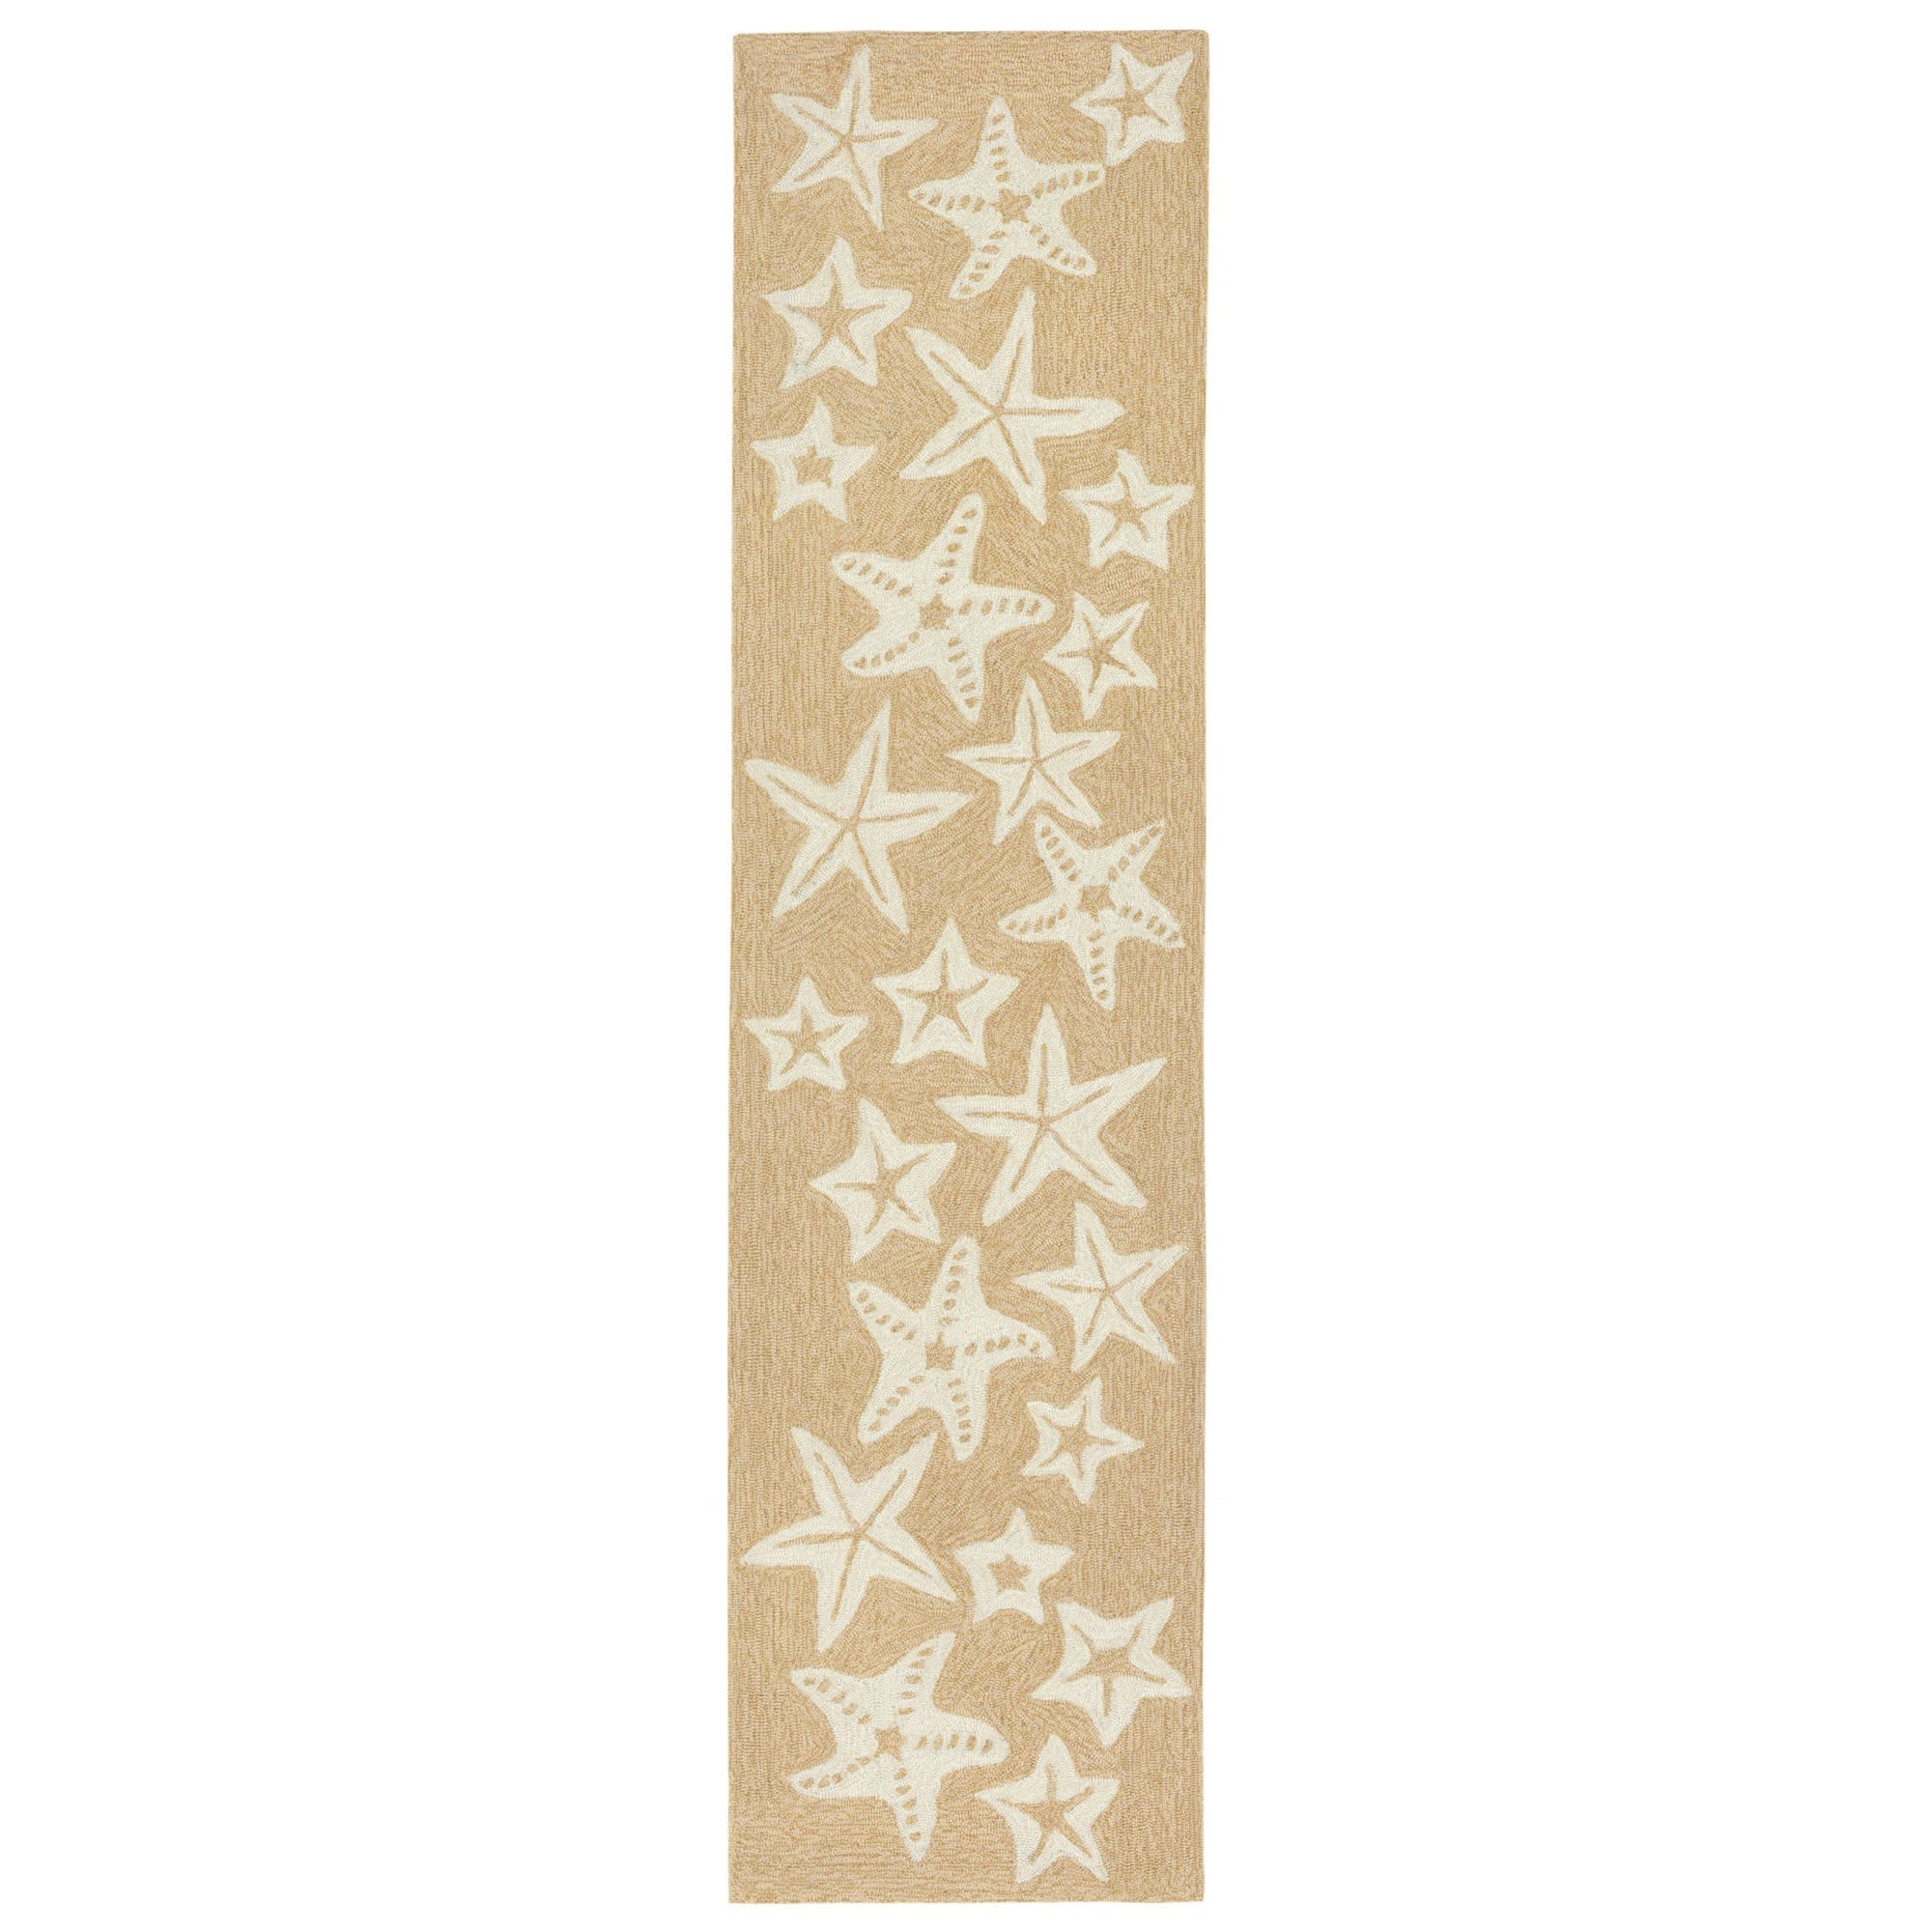 Starfish Neutral Rug 24x60